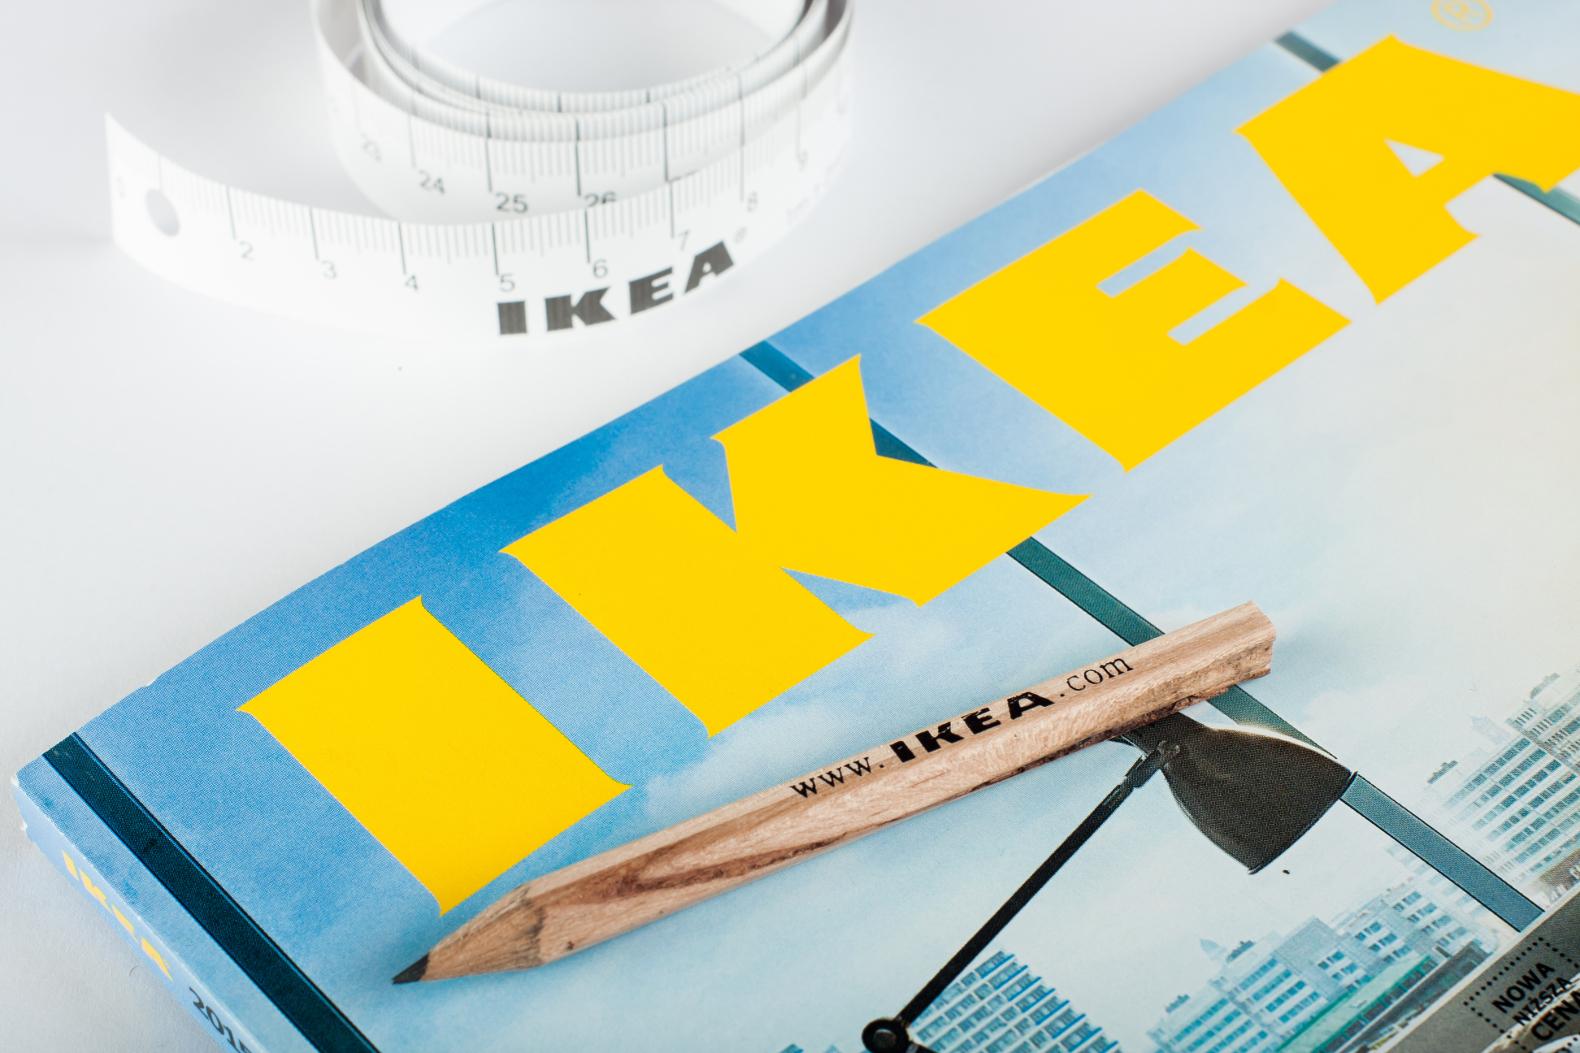 IKEA: Building creative and innovative capacity